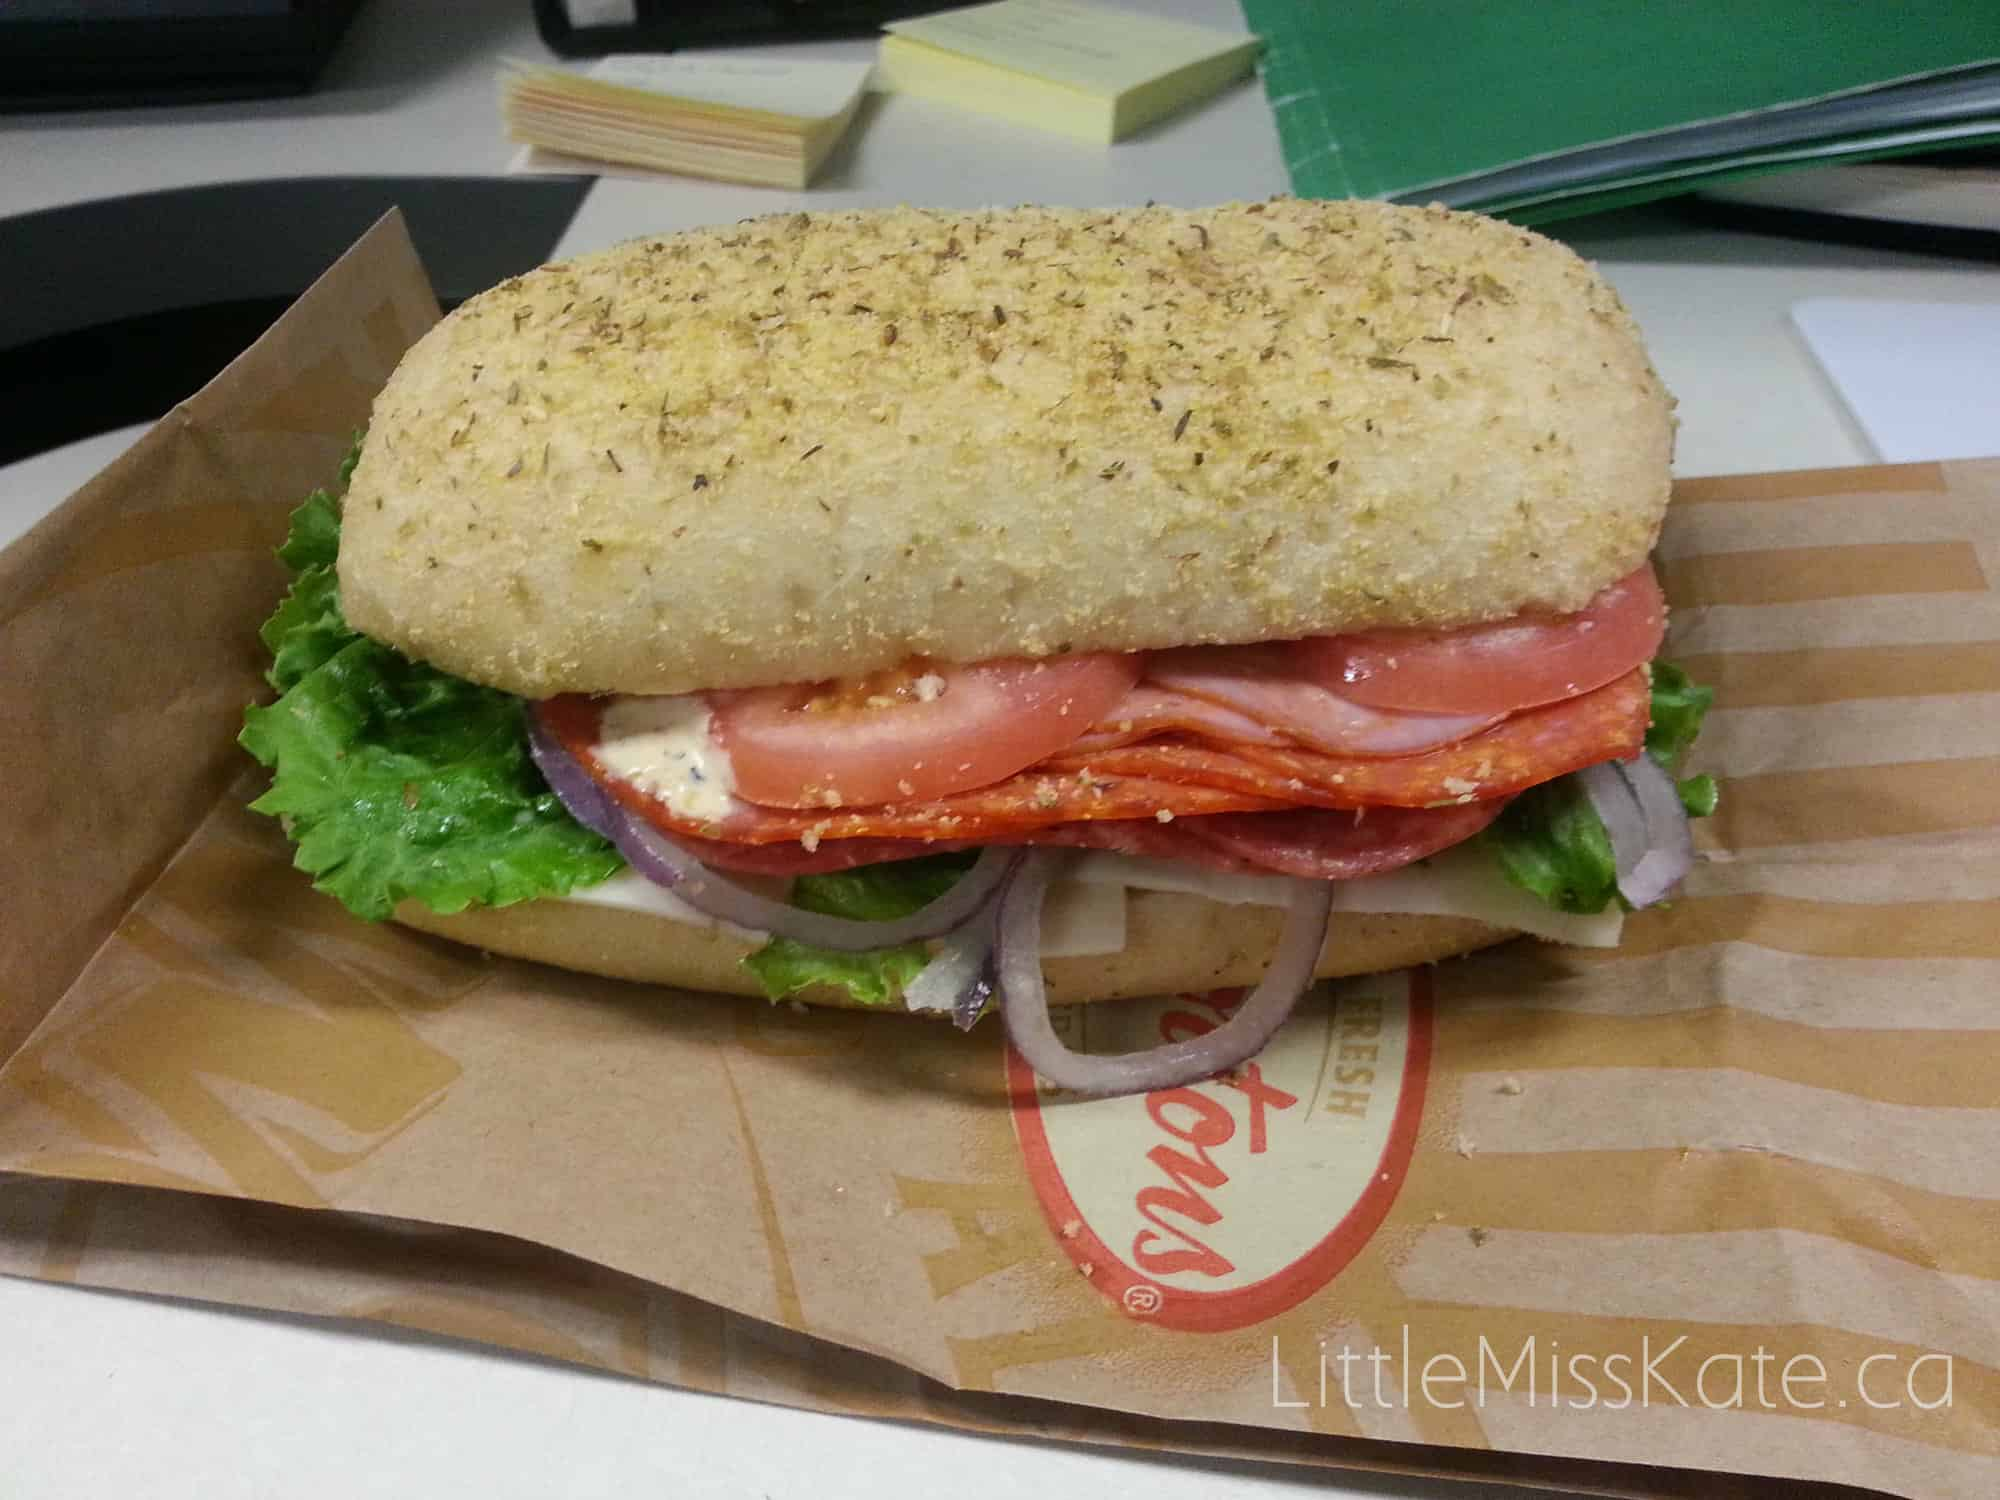 Tim Hortons Extreme Italian Sandwich